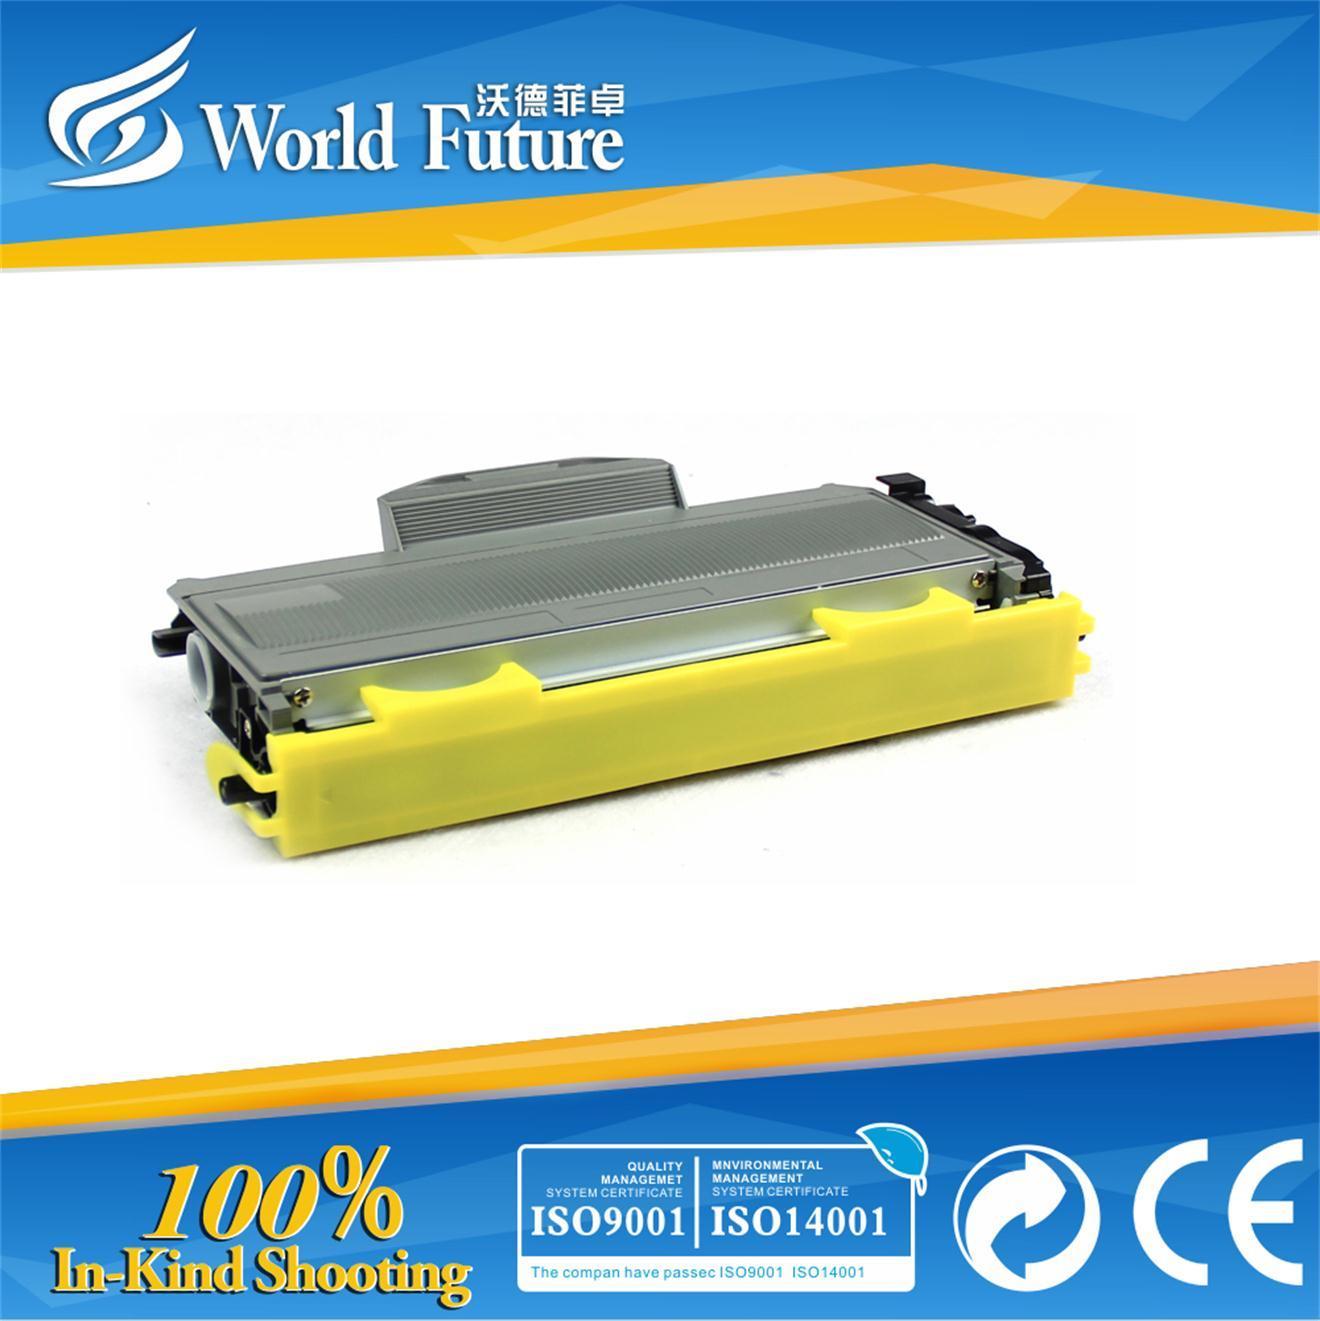 Wholesale Premium New/Remanufactured Black Laser Printer Toner Cartridge for Brother Tn-330/2110/2115/2130/Tn-26j/360/2125/2150/2120/2175 (Toner)